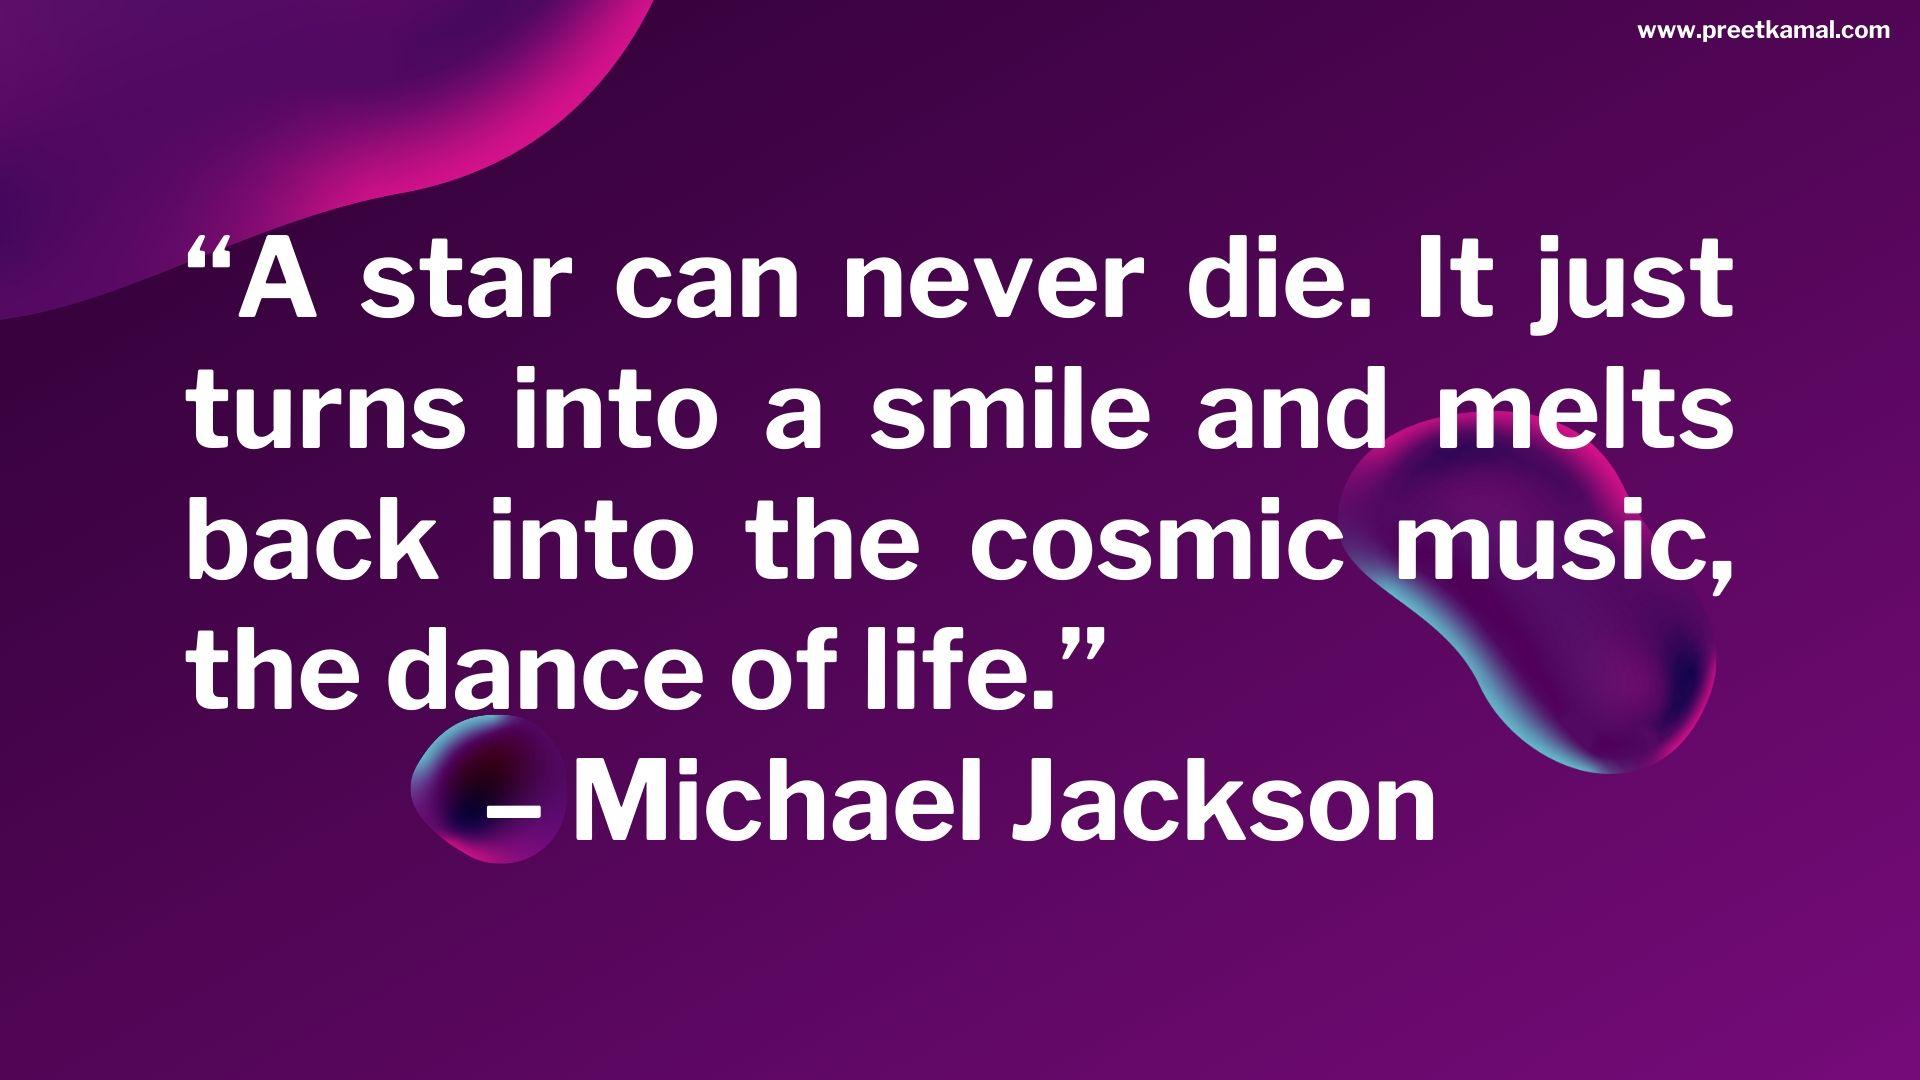 Michael Jackson Quotes (6)